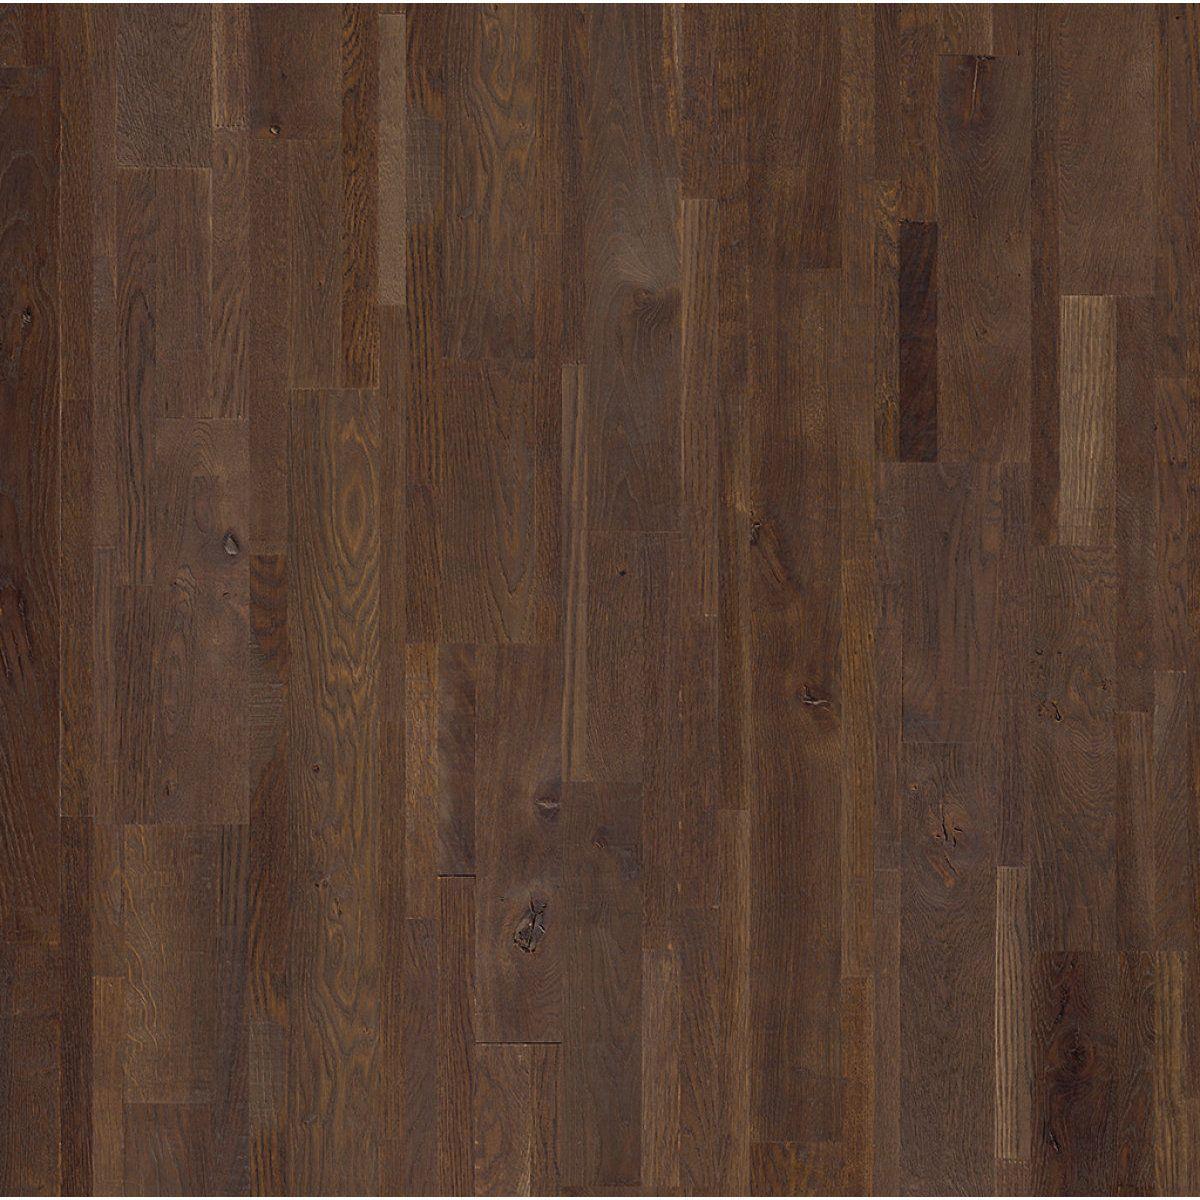 parquet contrecoll variano ch ne espresso m lange huil bross bords droits sans chanfrein. Black Bedroom Furniture Sets. Home Design Ideas